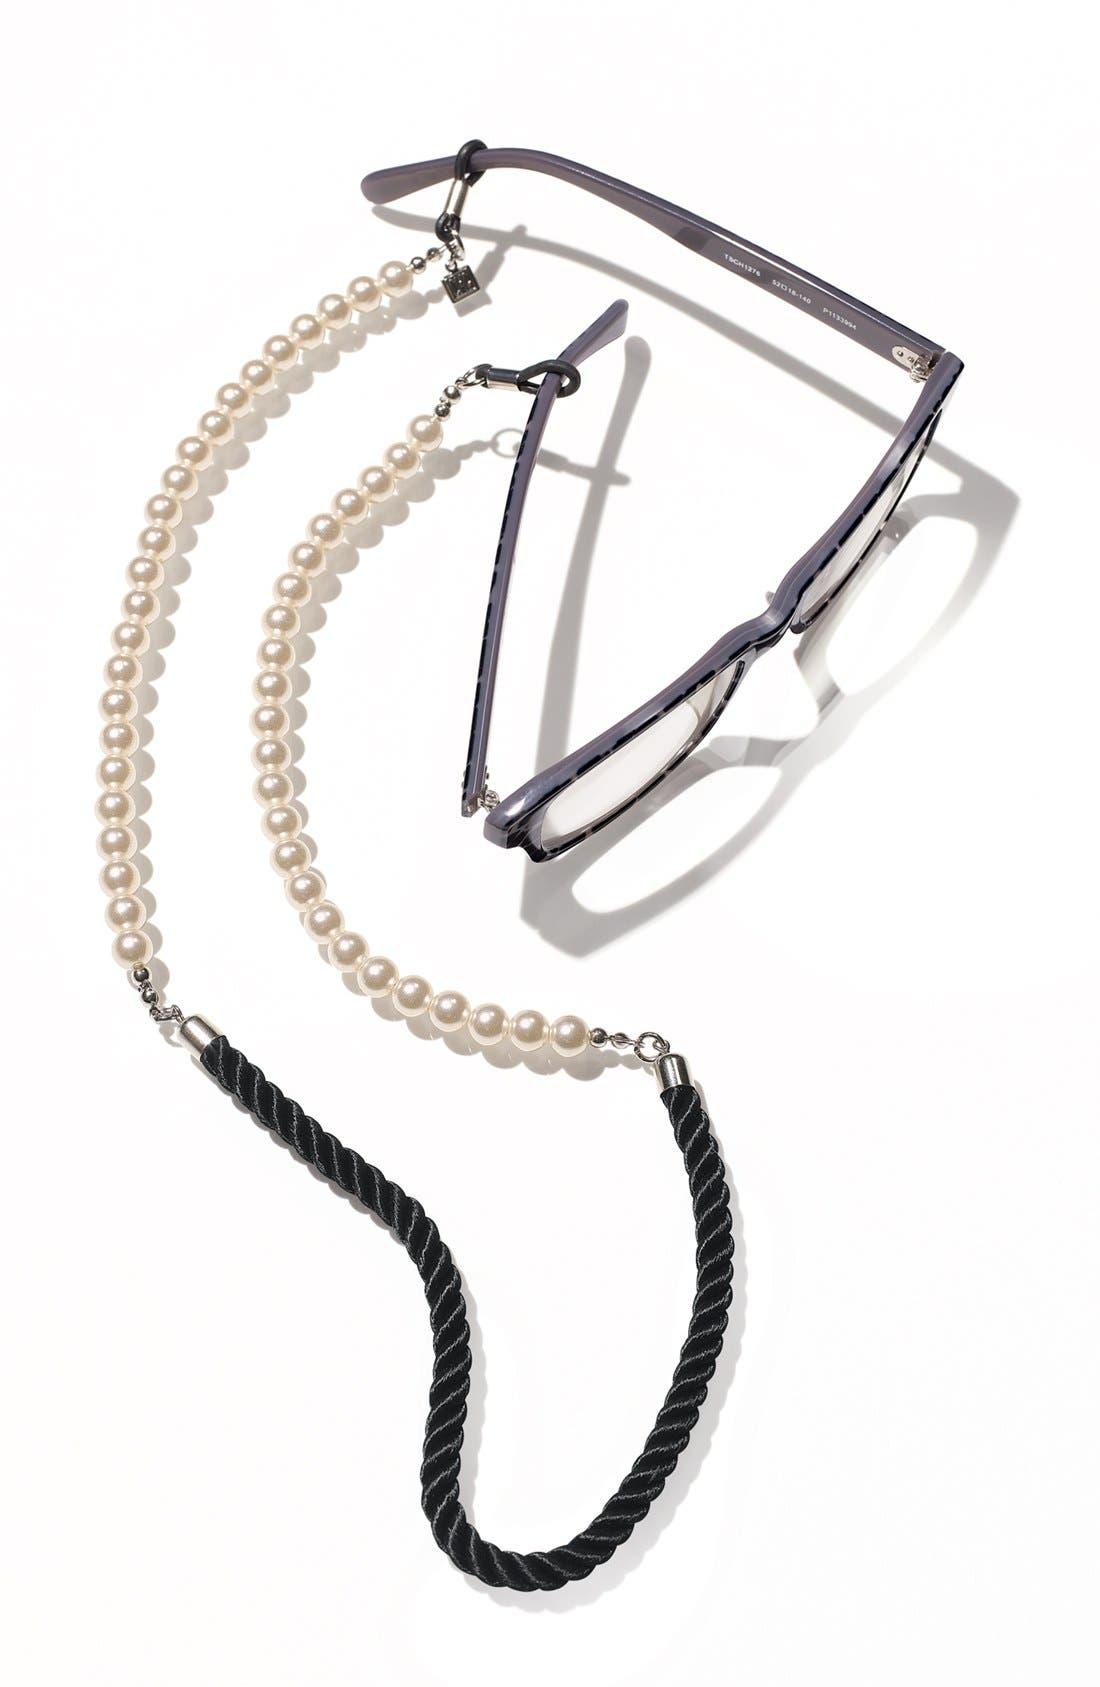 'Pearls' Eyewear Chain,                             Alternate thumbnail 3, color,                             900